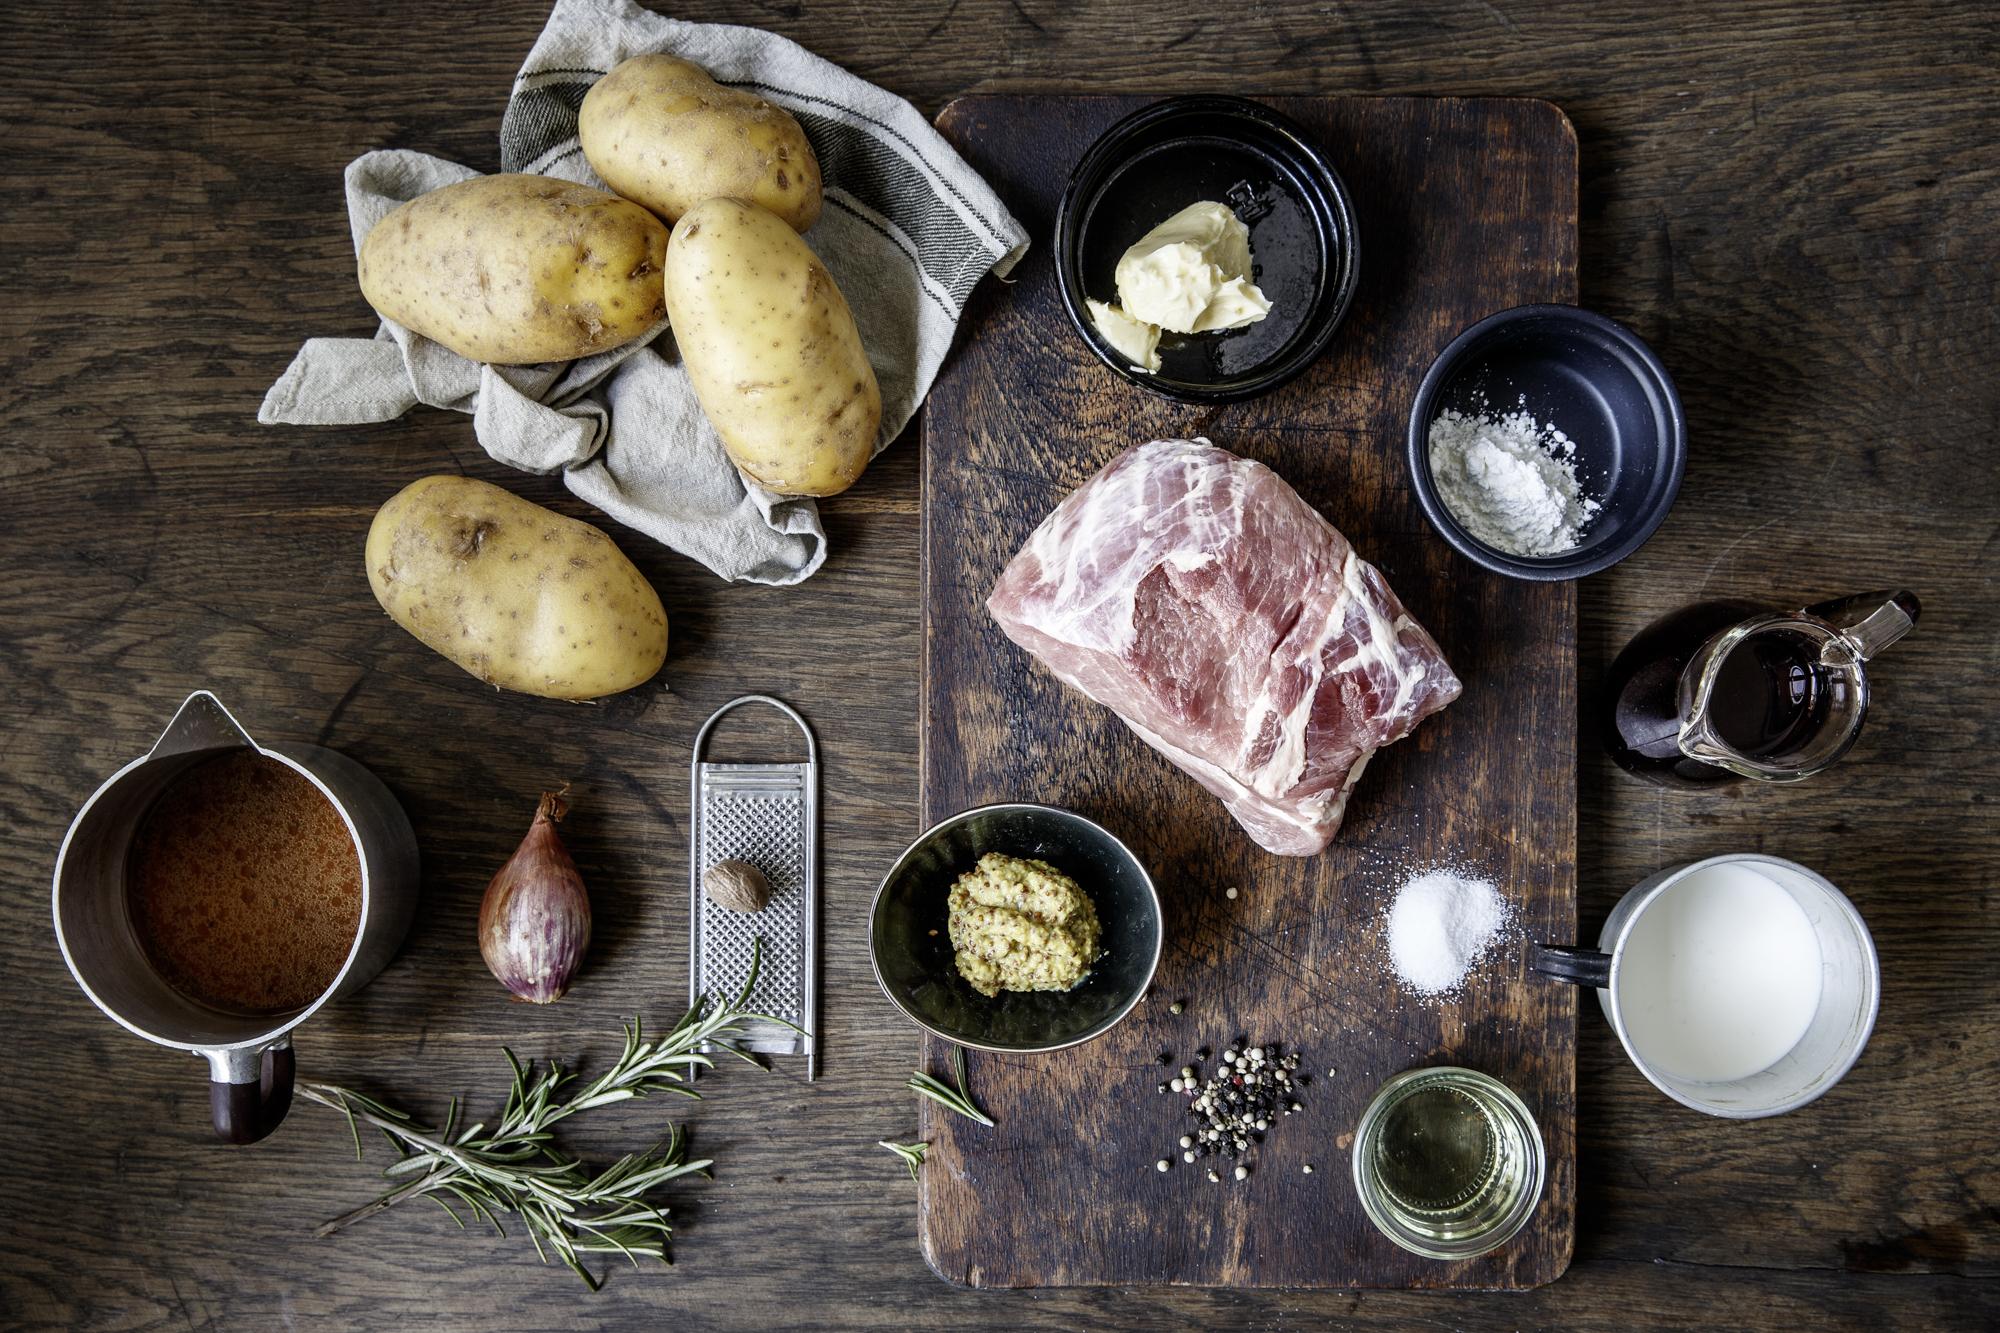 Food-Fotografie Meatlove, Stefan Schmidlin Fotograf Basel; Bild 1.jpg